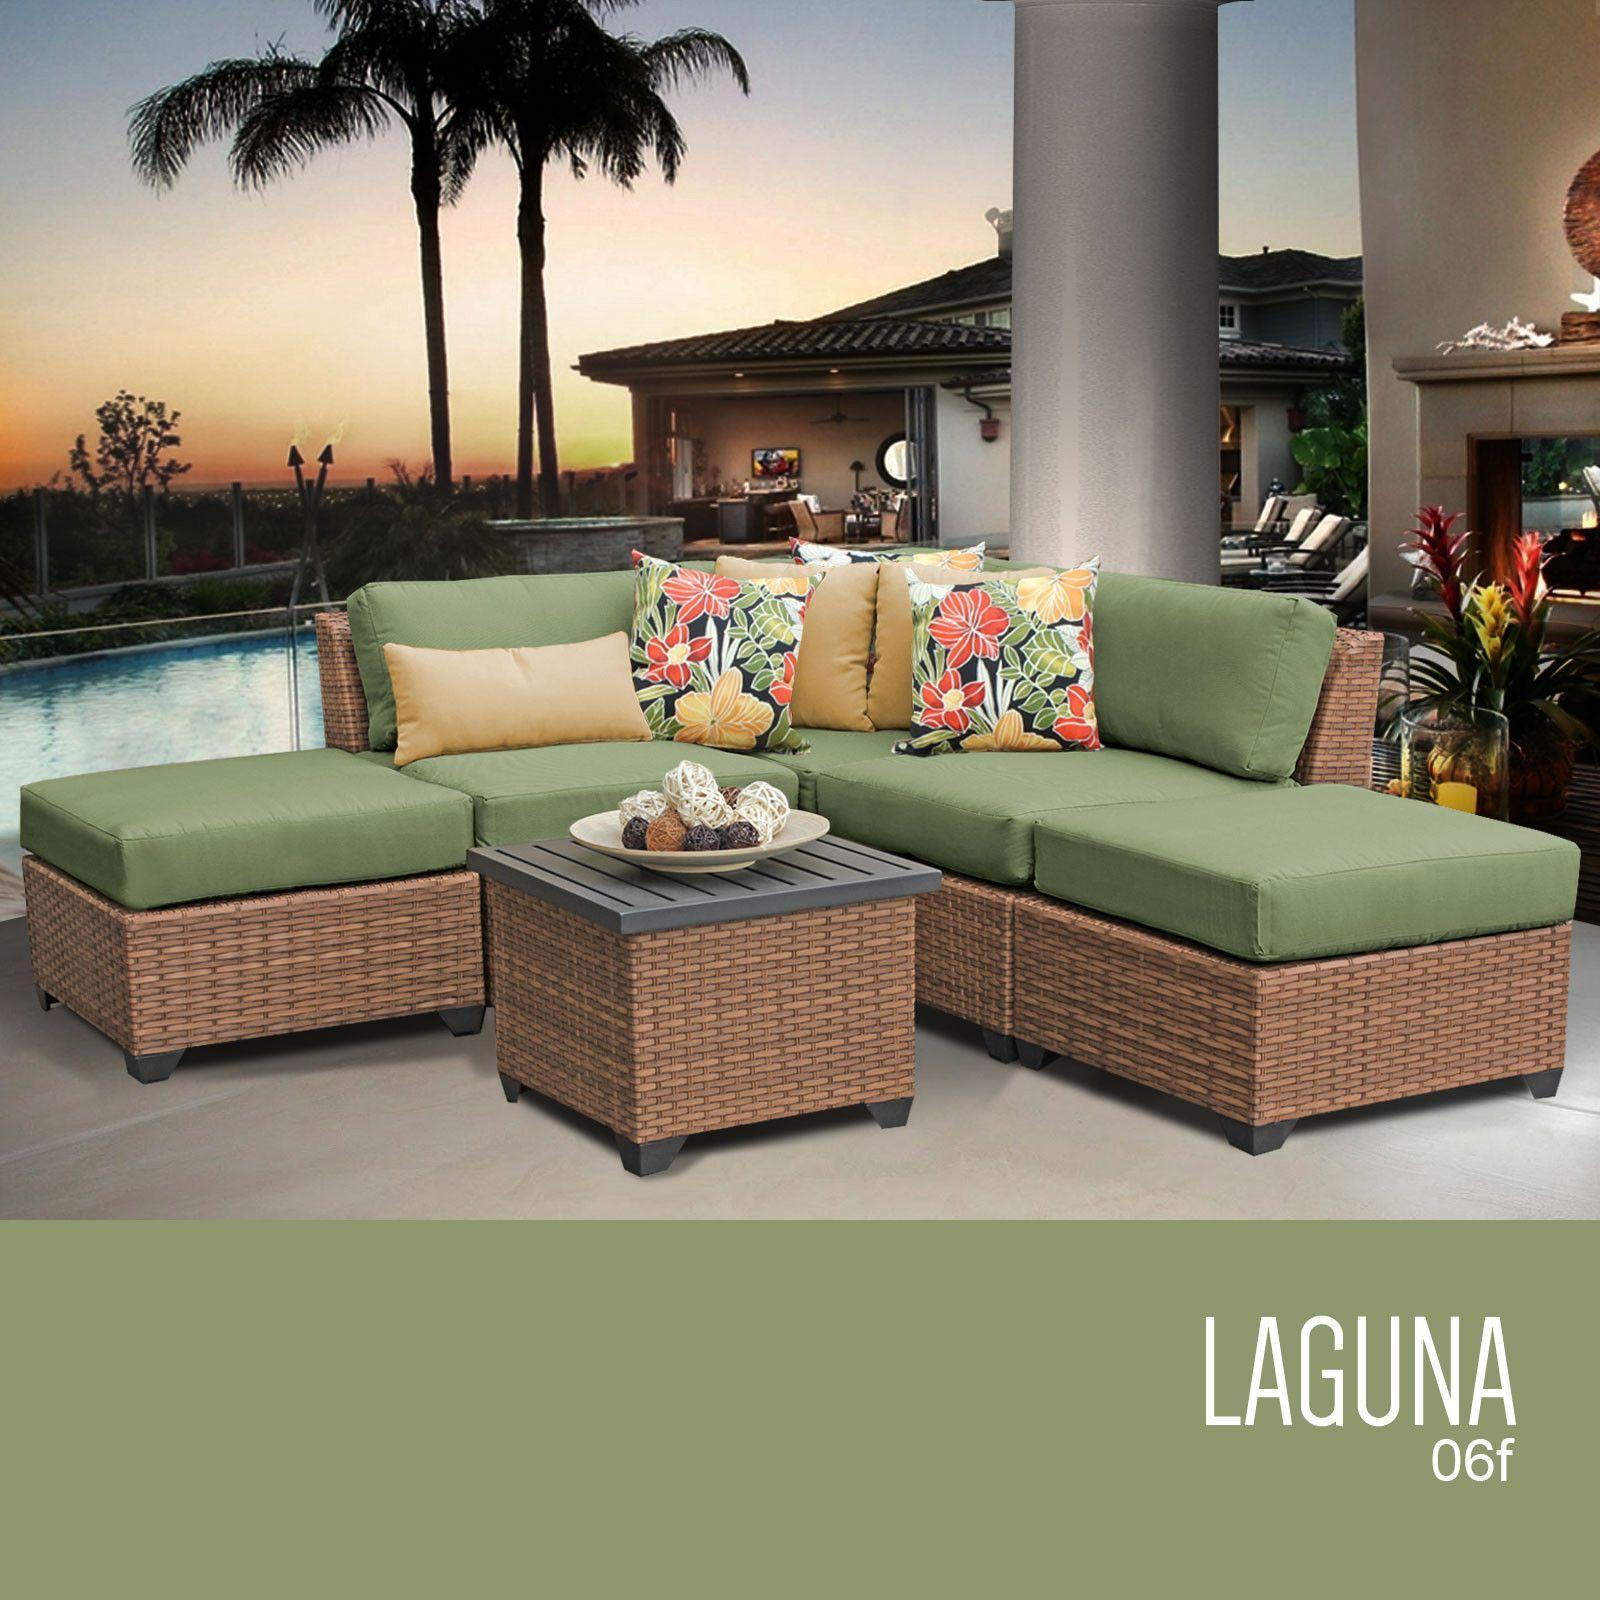 Buy laguna piece outdoor wicker patio furniture set f at